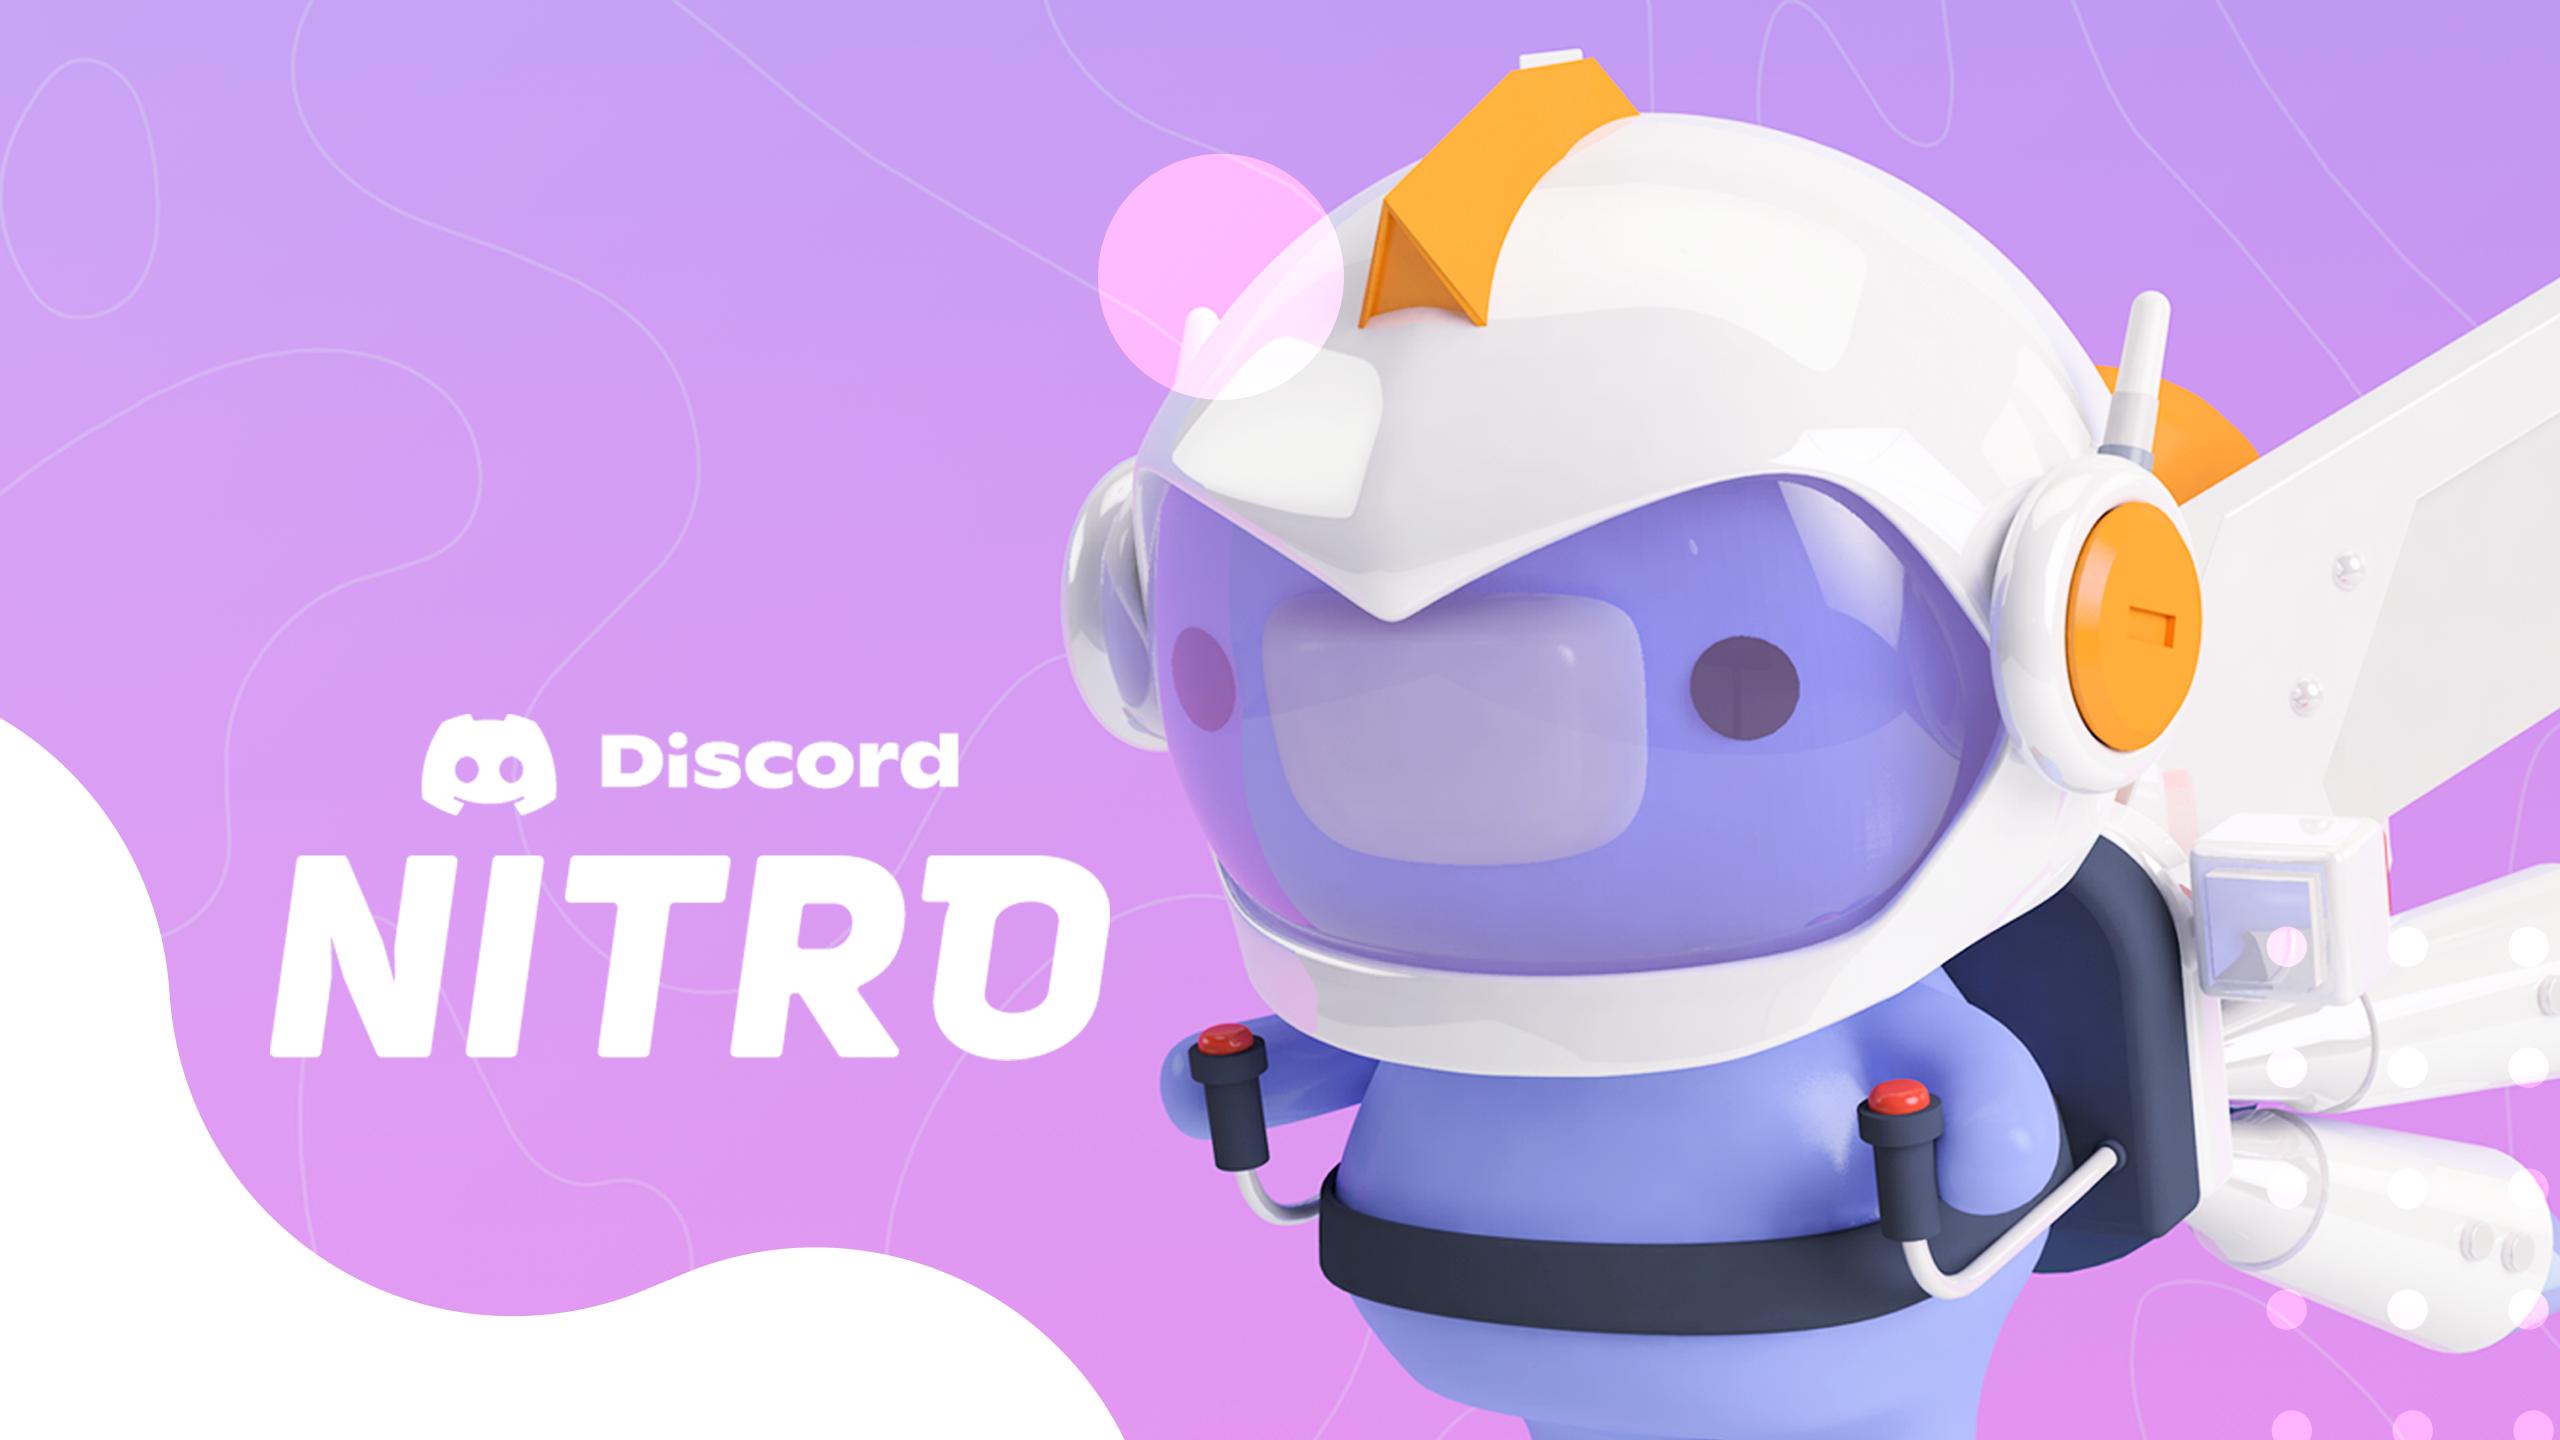 Discord Nitro 무료 다운로드 - Epic Games Store